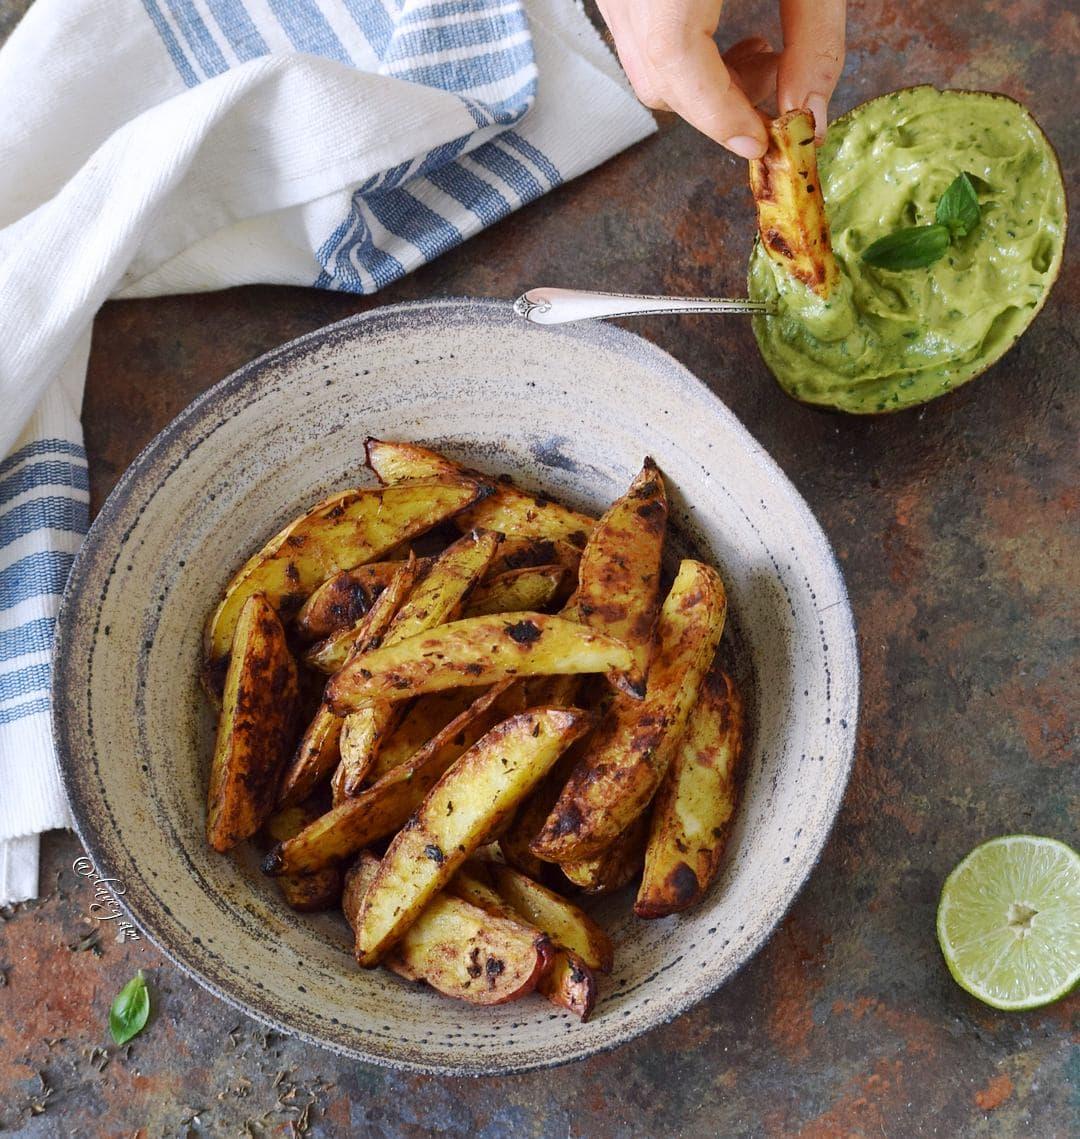 oven baked potato wedges recipe vegan and gluten free